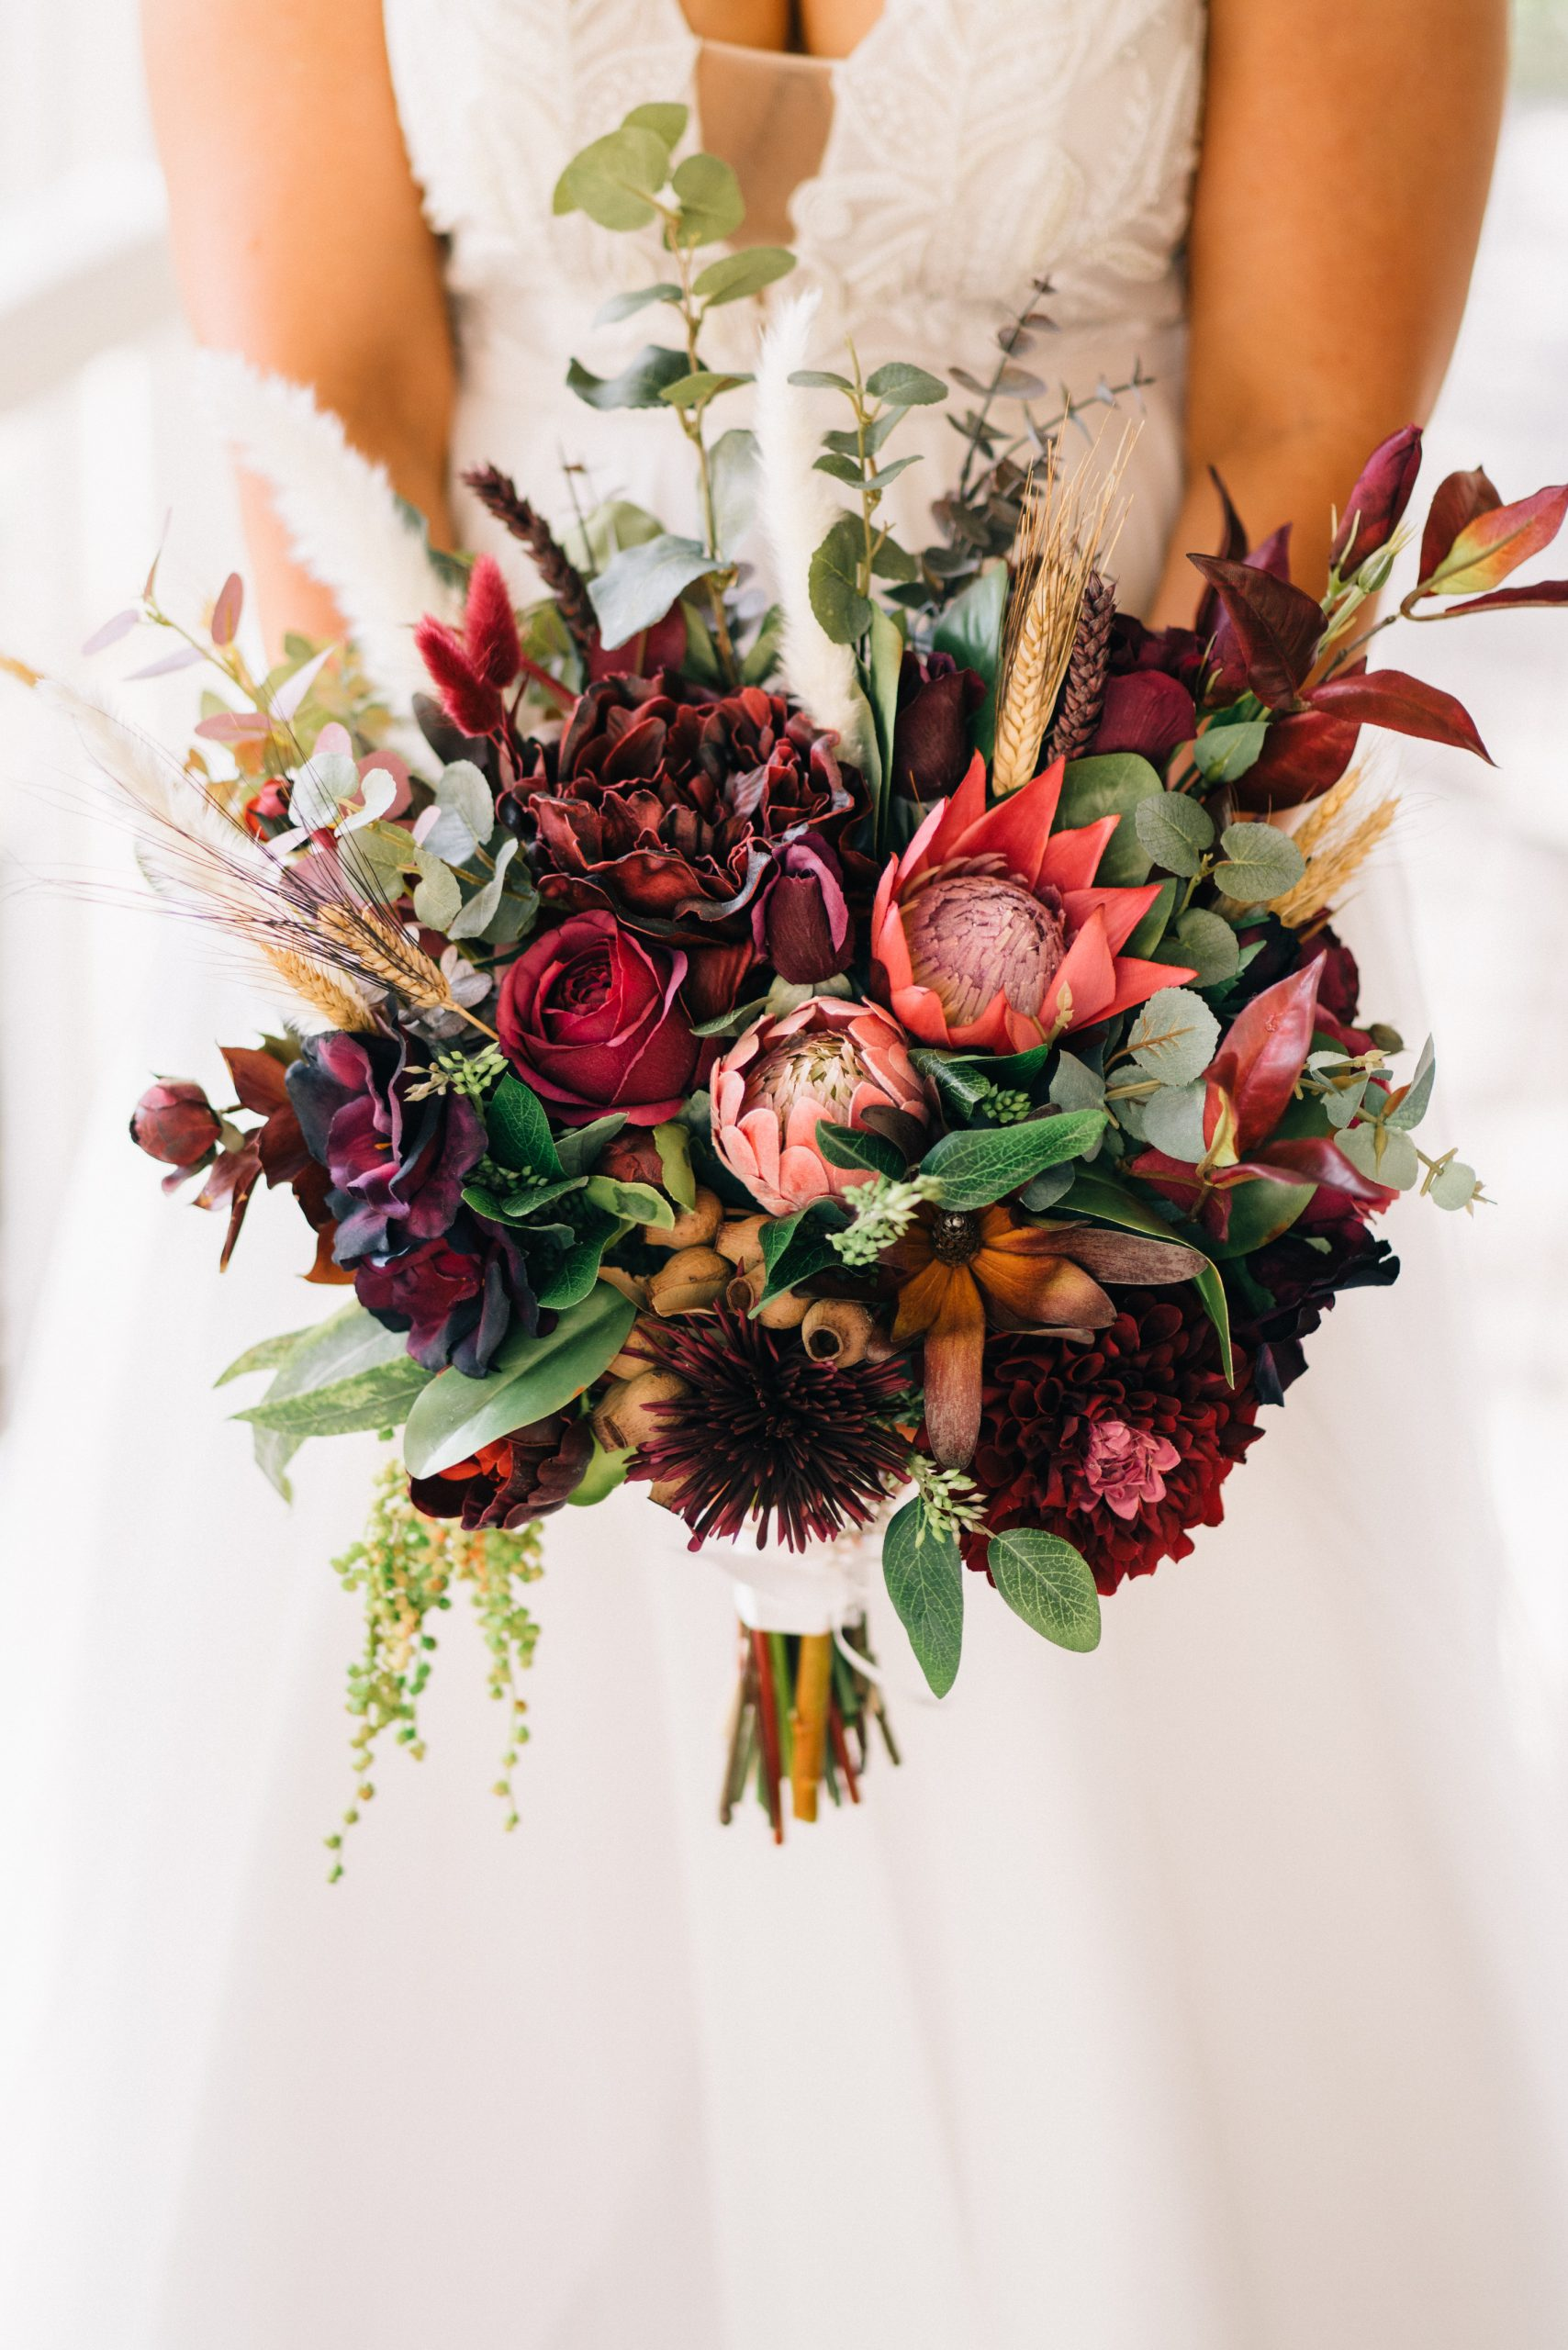 brides flower bouquet before the wedding at brooklyn farm